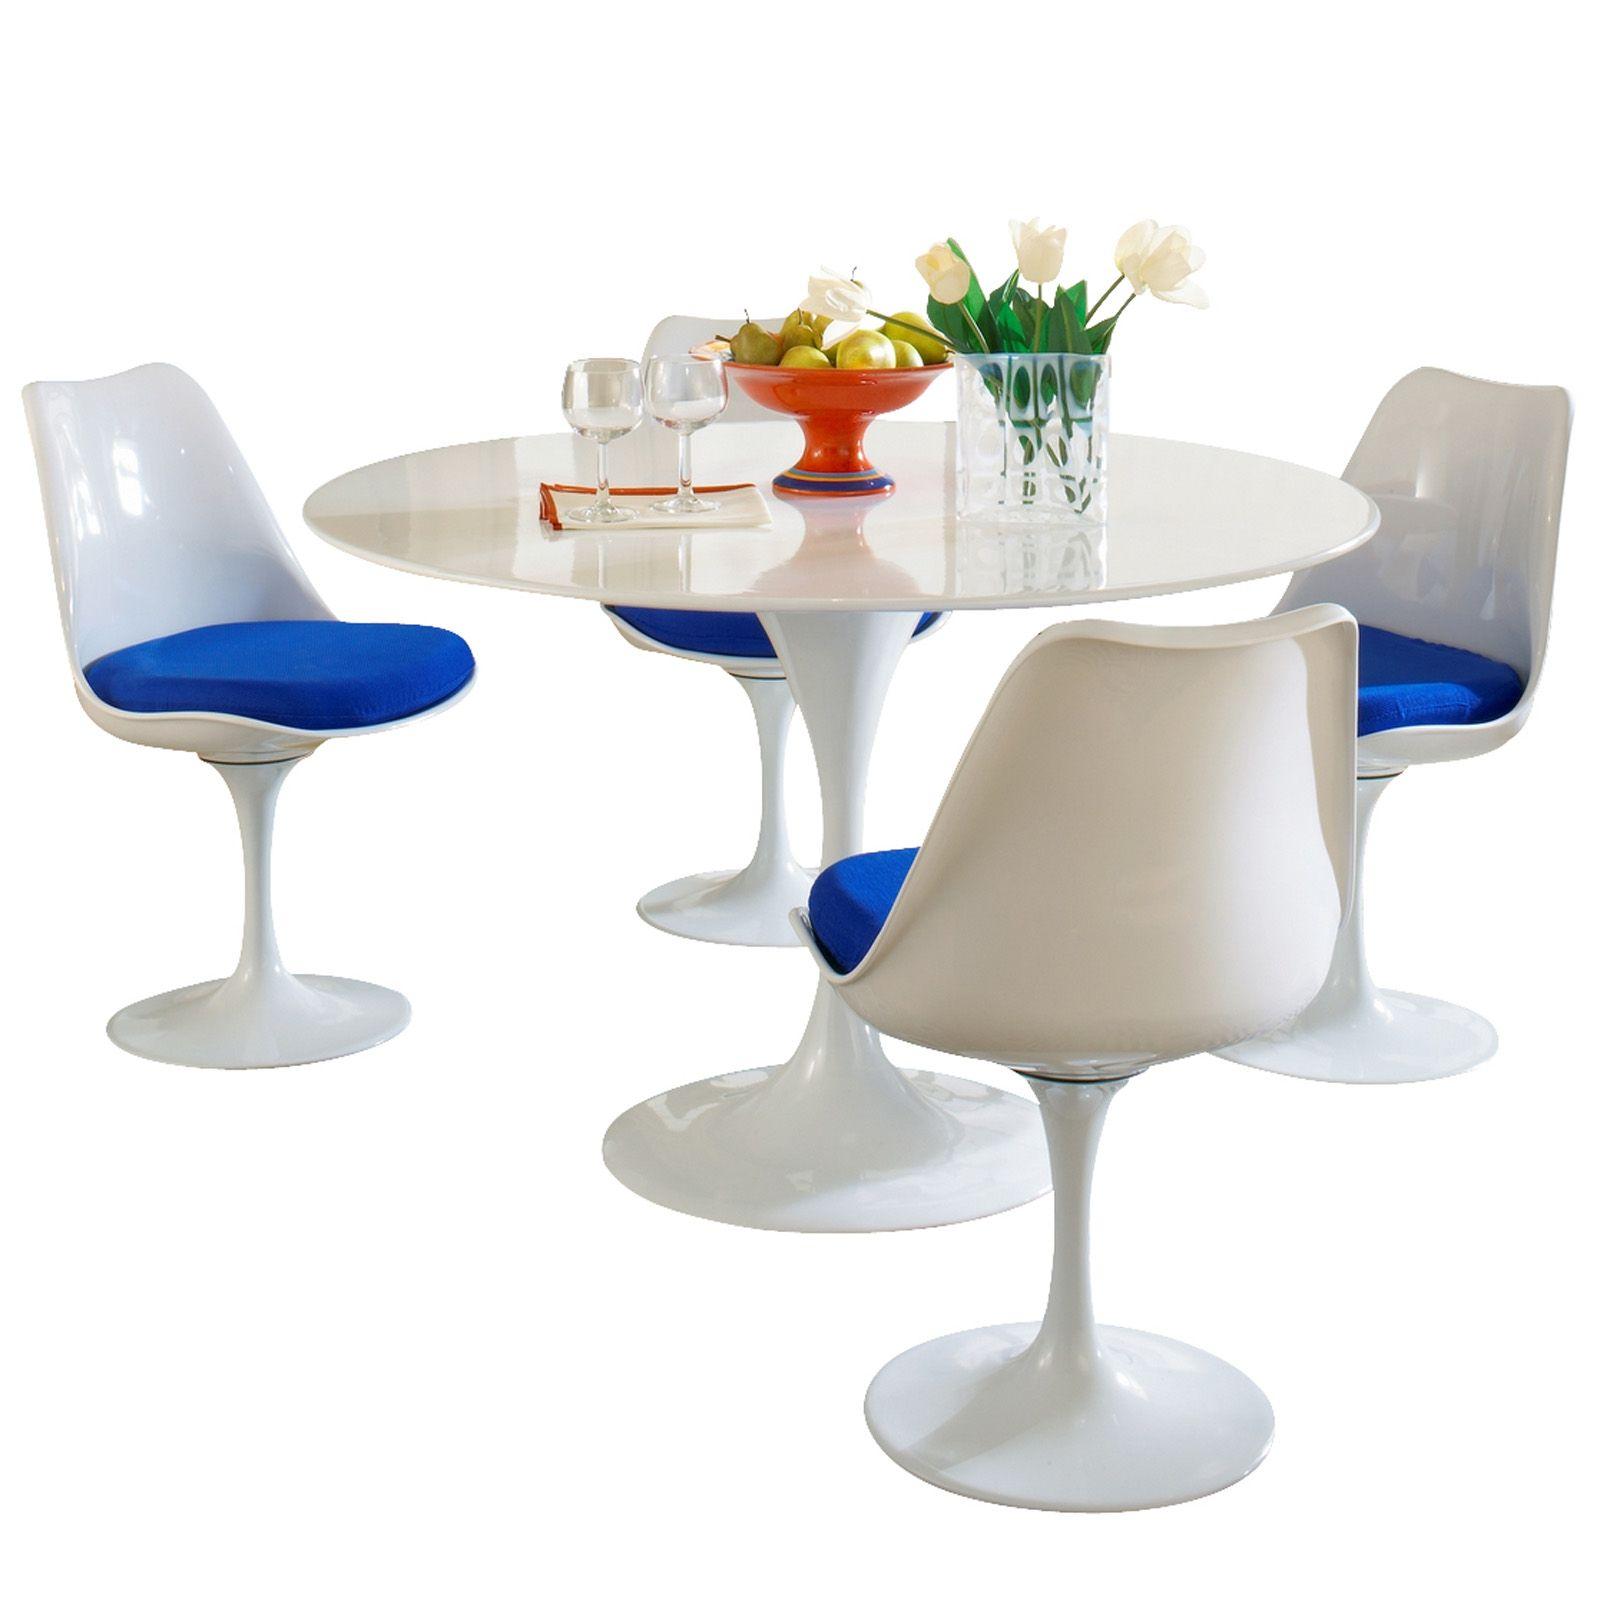 Modway Eero Saarinen Blue Cushion Dining Set (Eero Saarinen Style